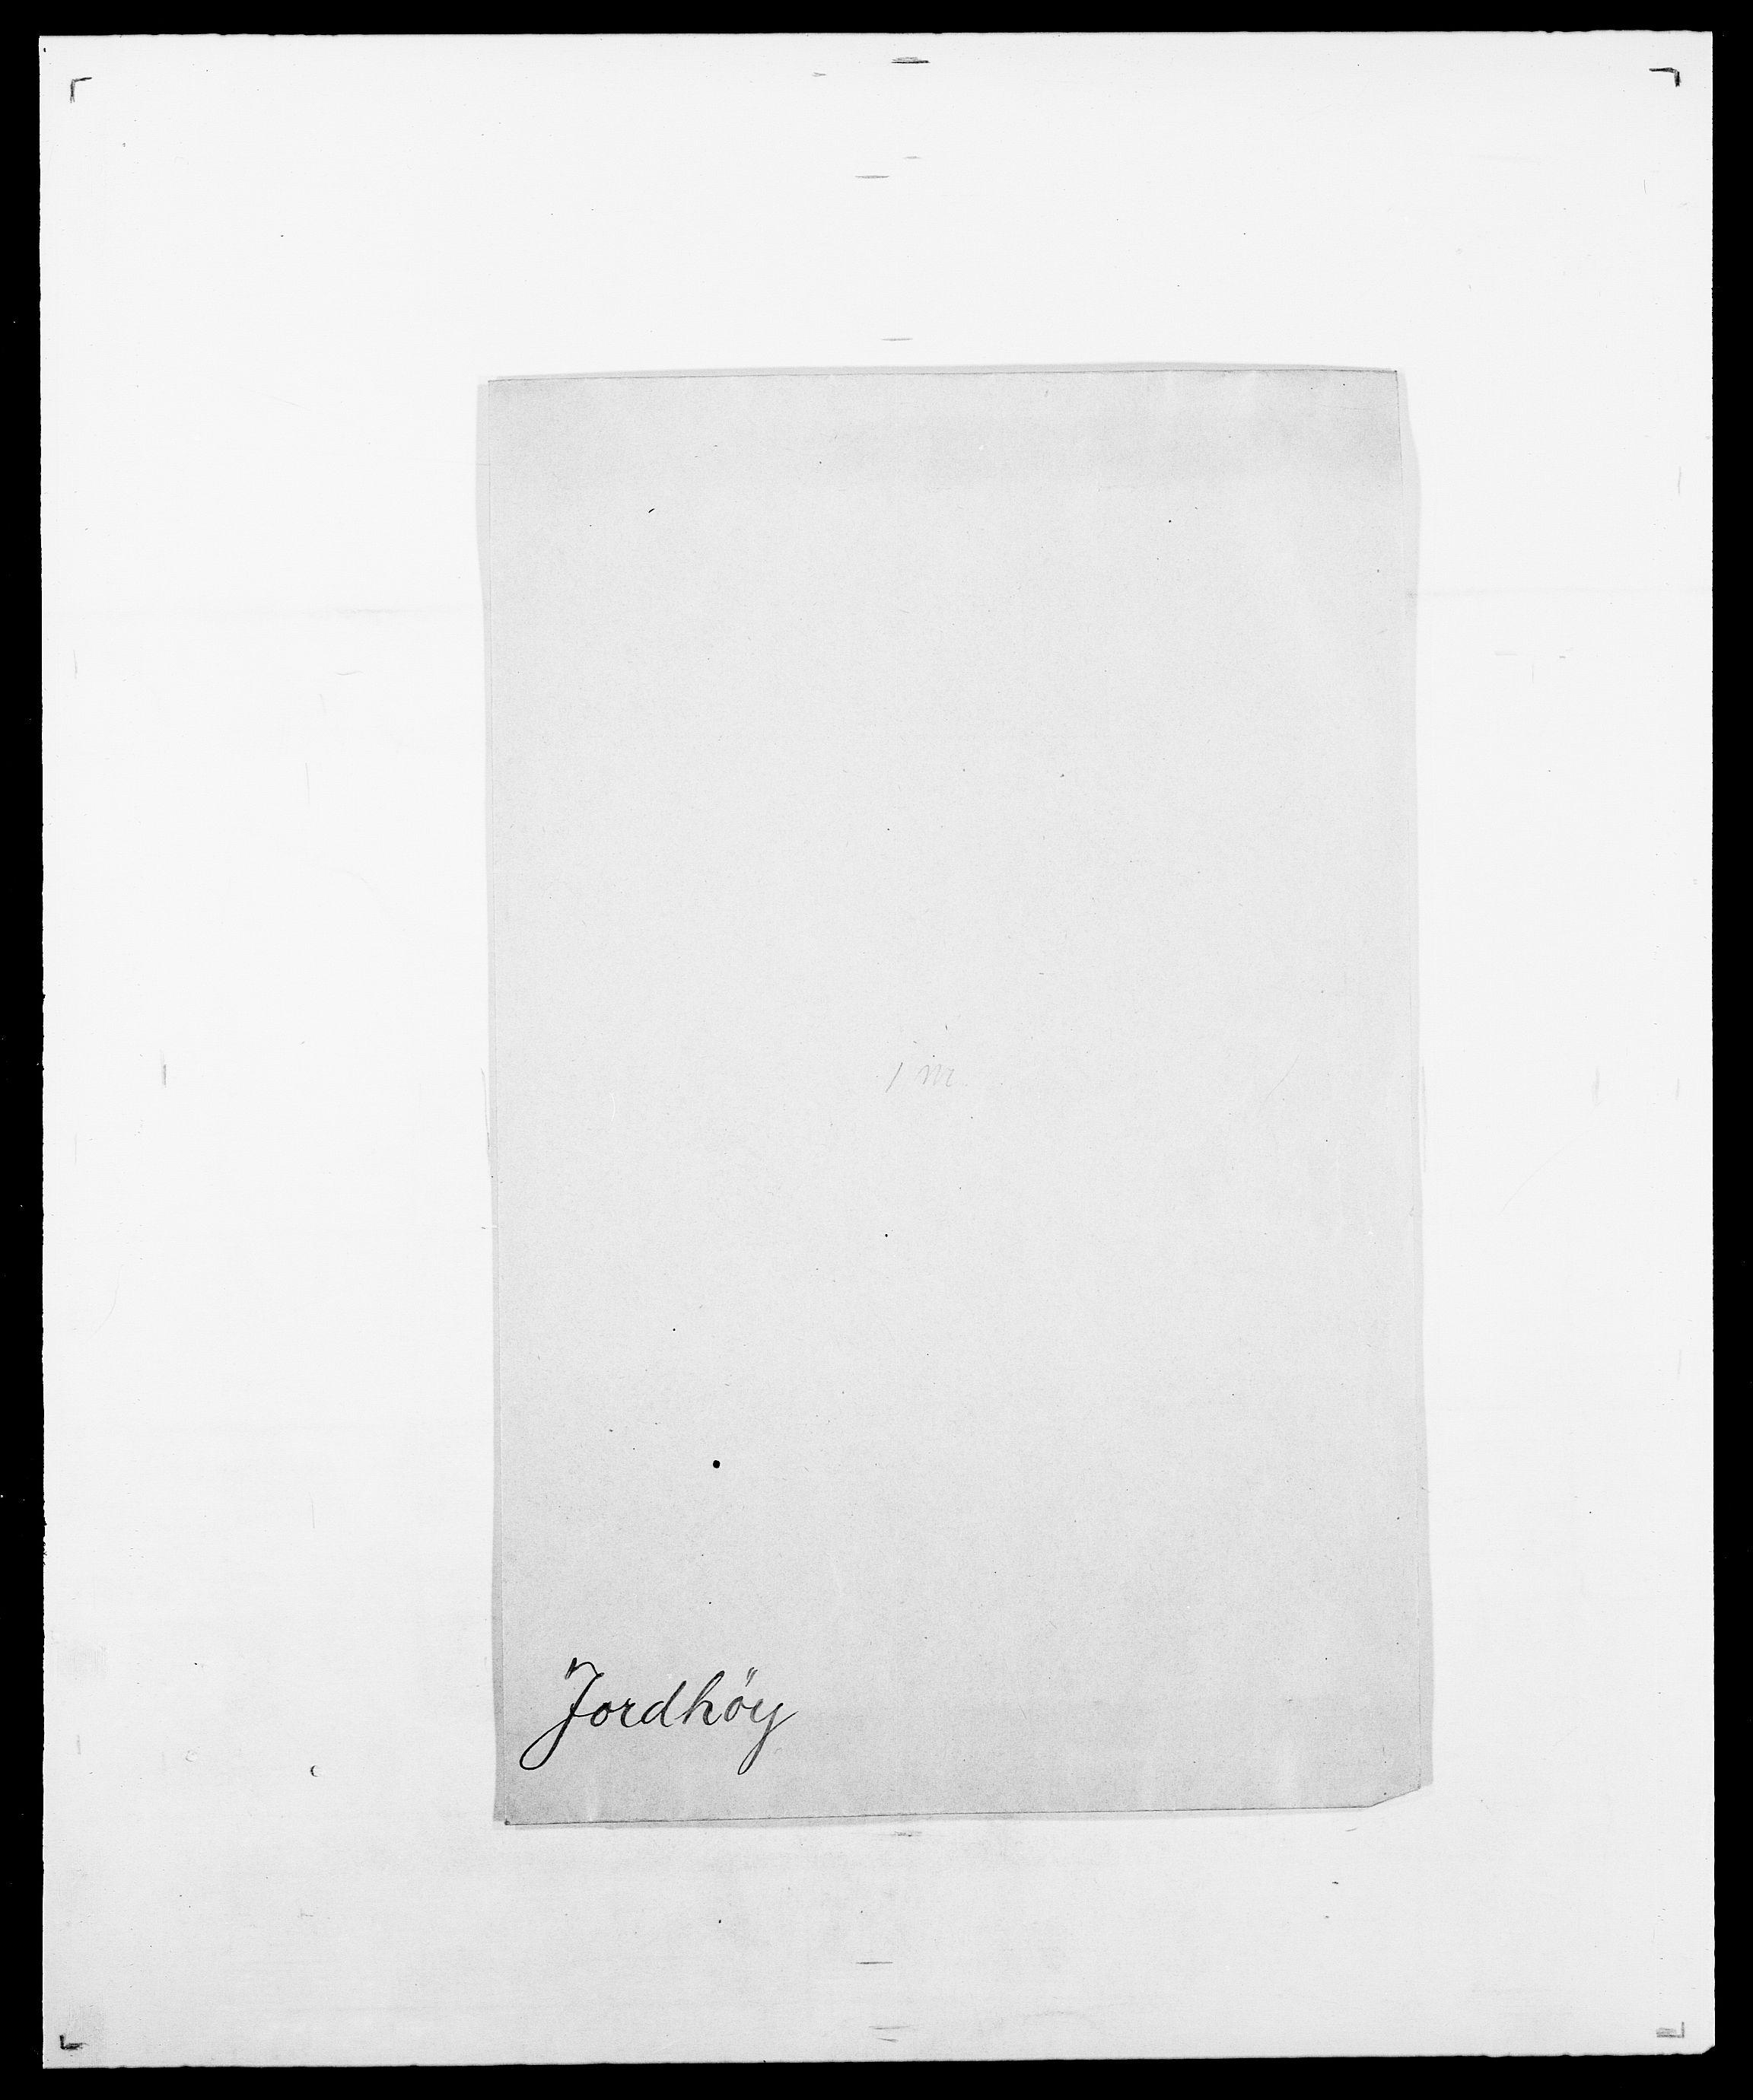 SAO, Delgobe, Charles Antoine - samling, D/Da/L0019: van der Hude - Joys, s. 914